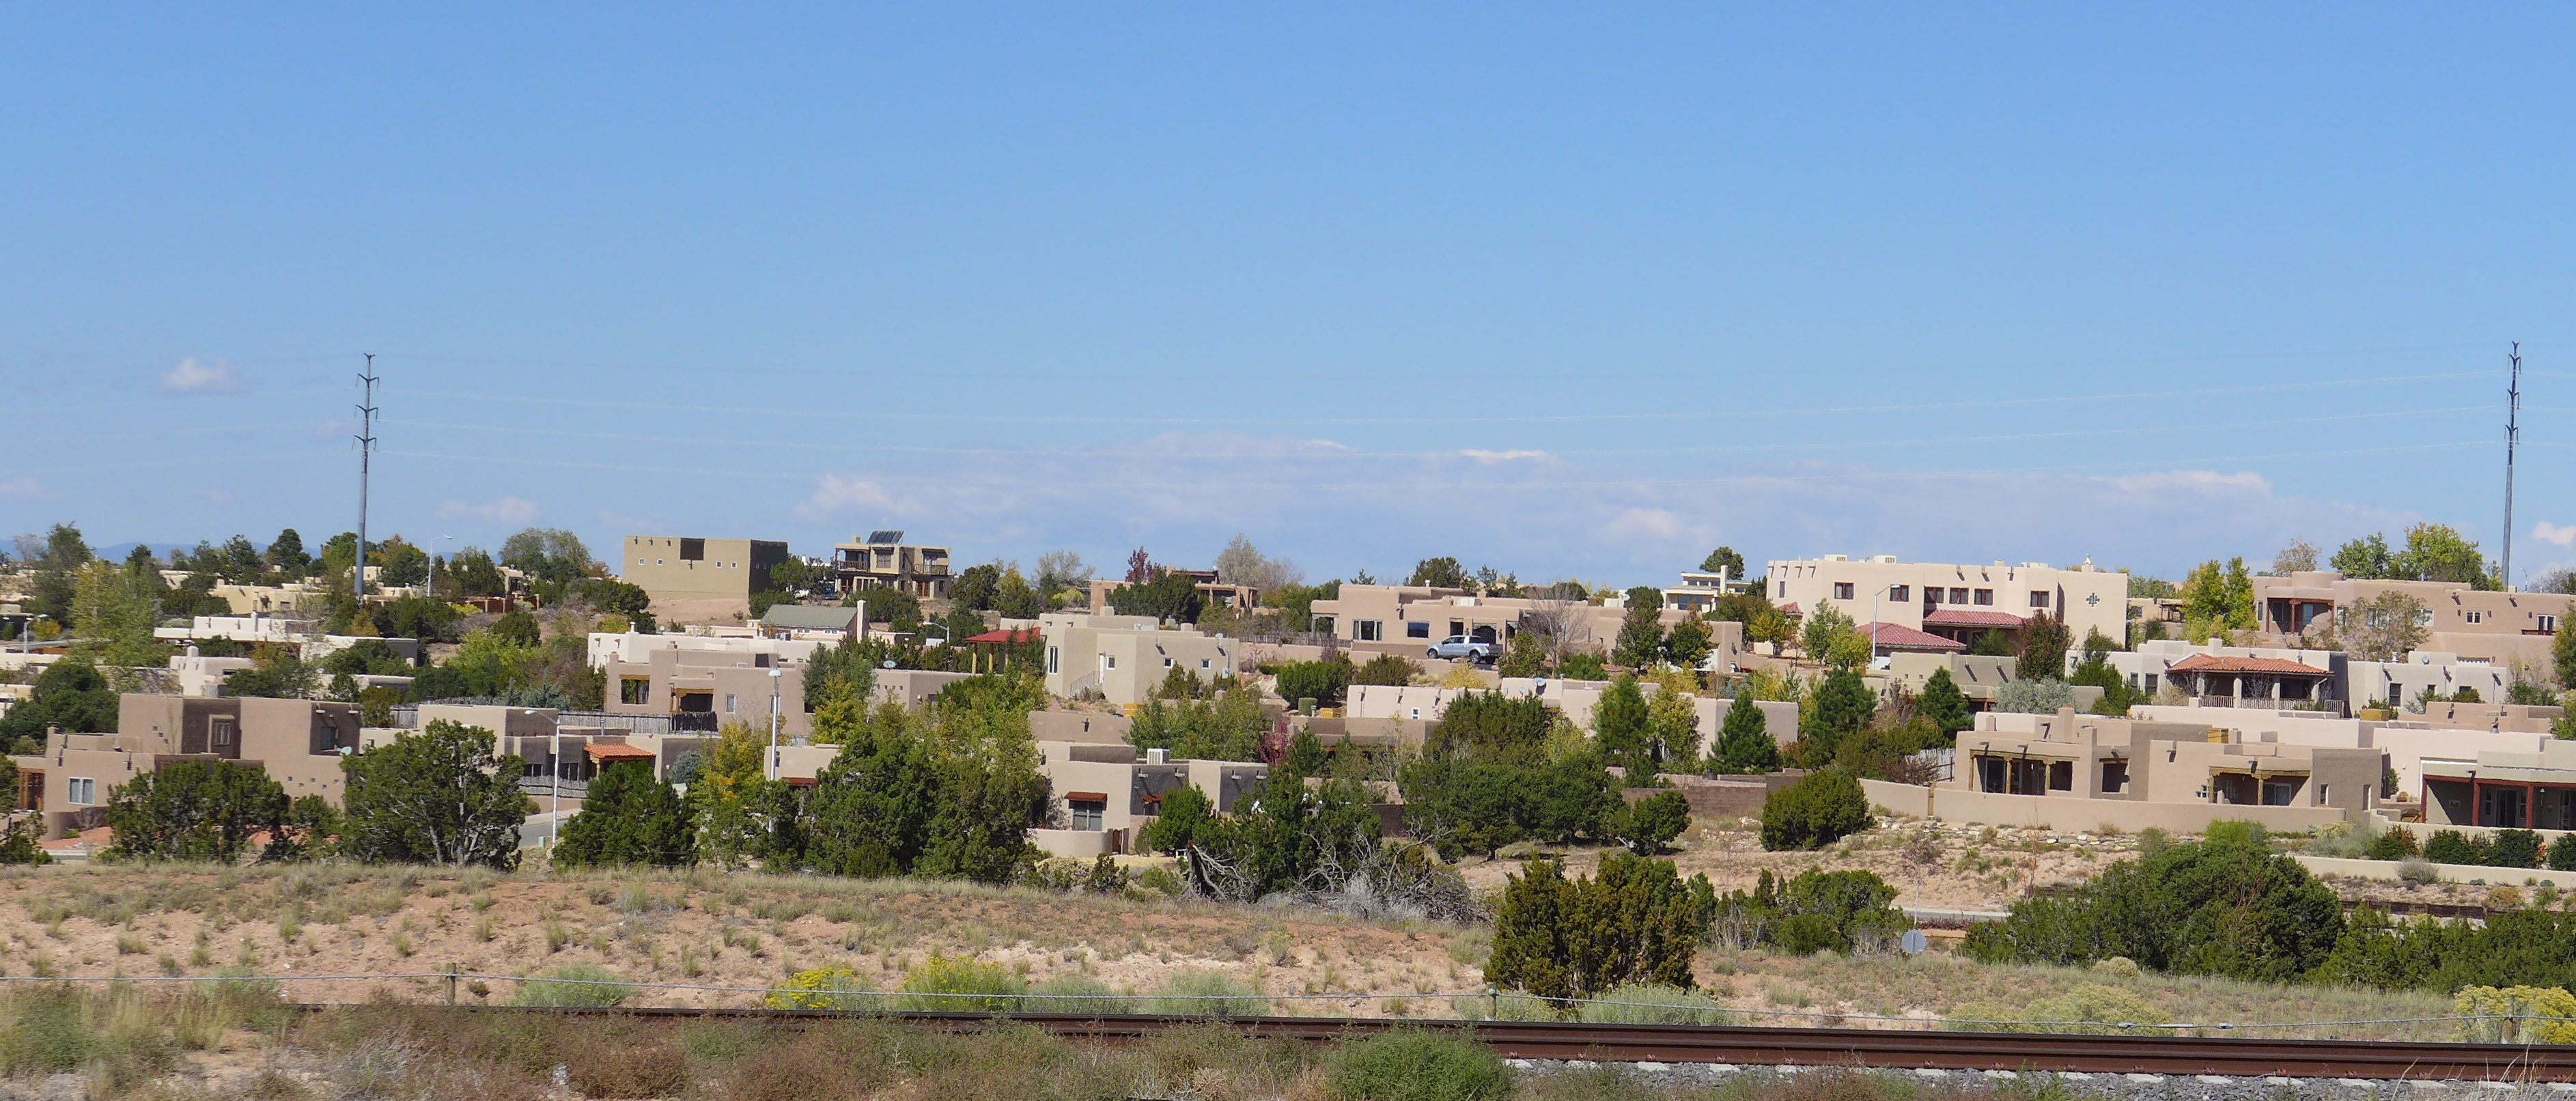 Suburban sprawl on the fringes of Santa Fe